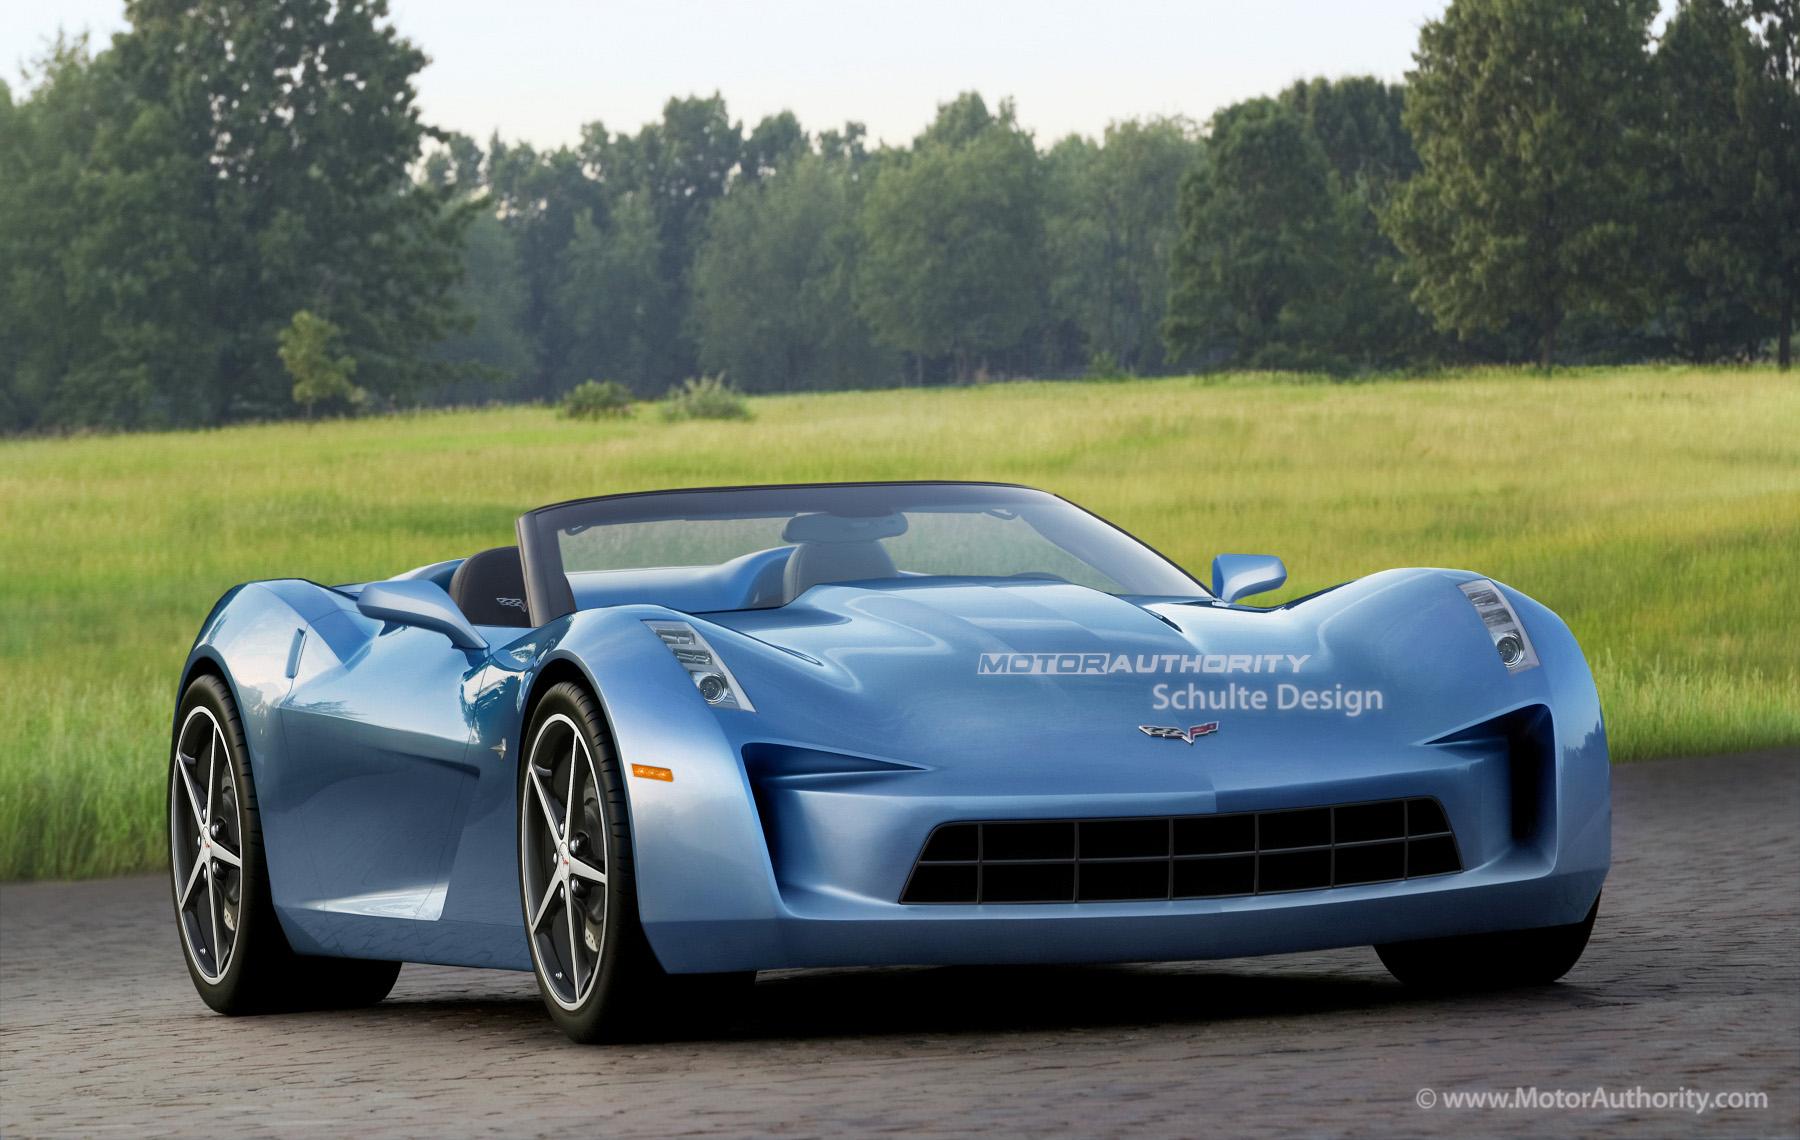 2014 Chevrolet Corvette Rumors Sprout Mid-Engine Talk Yet ...